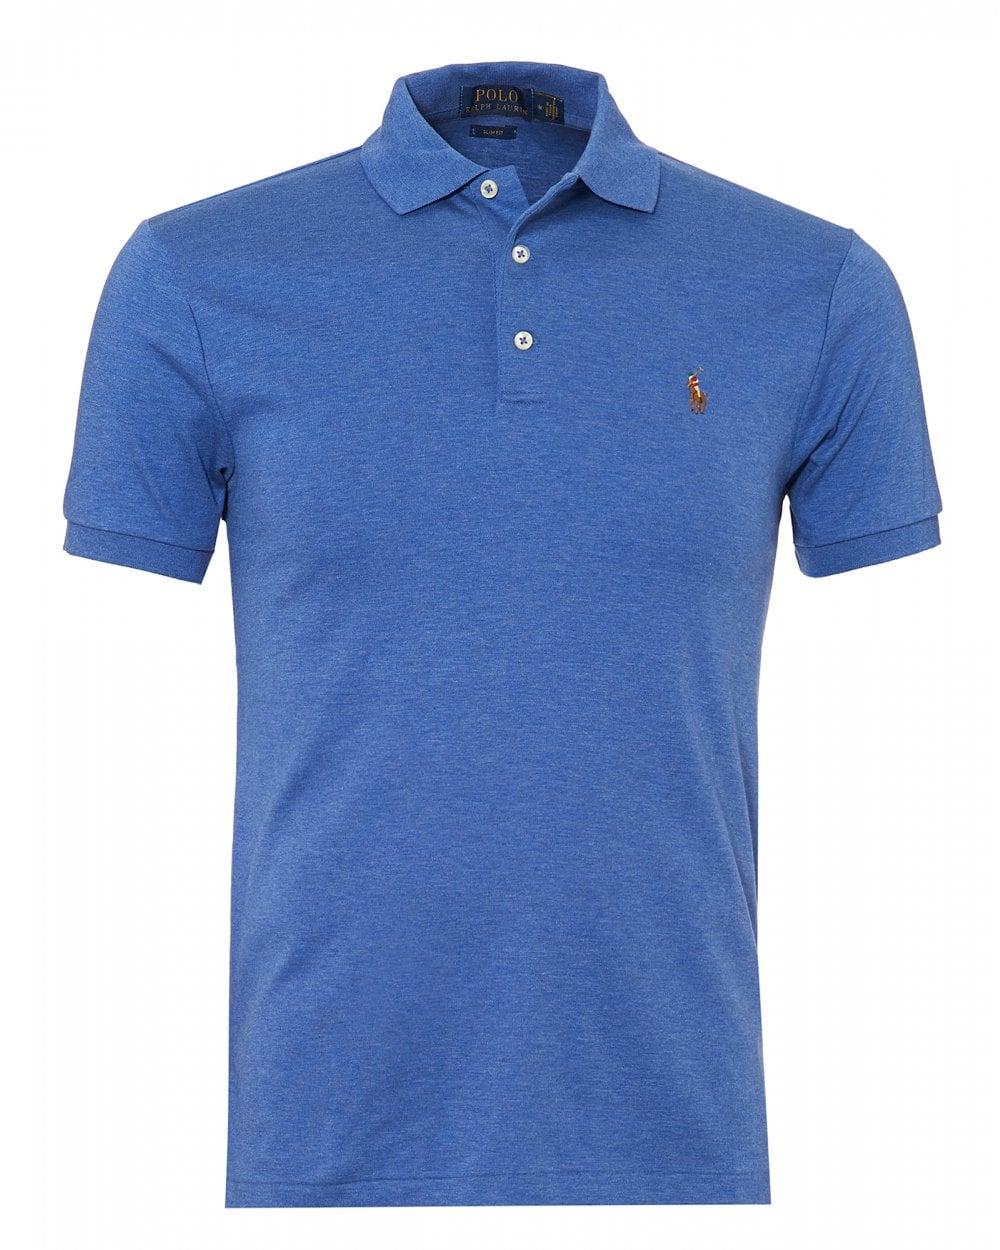 ralph lauren mens pima polo shirt slim fit blue heather polo. Black Bedroom Furniture Sets. Home Design Ideas